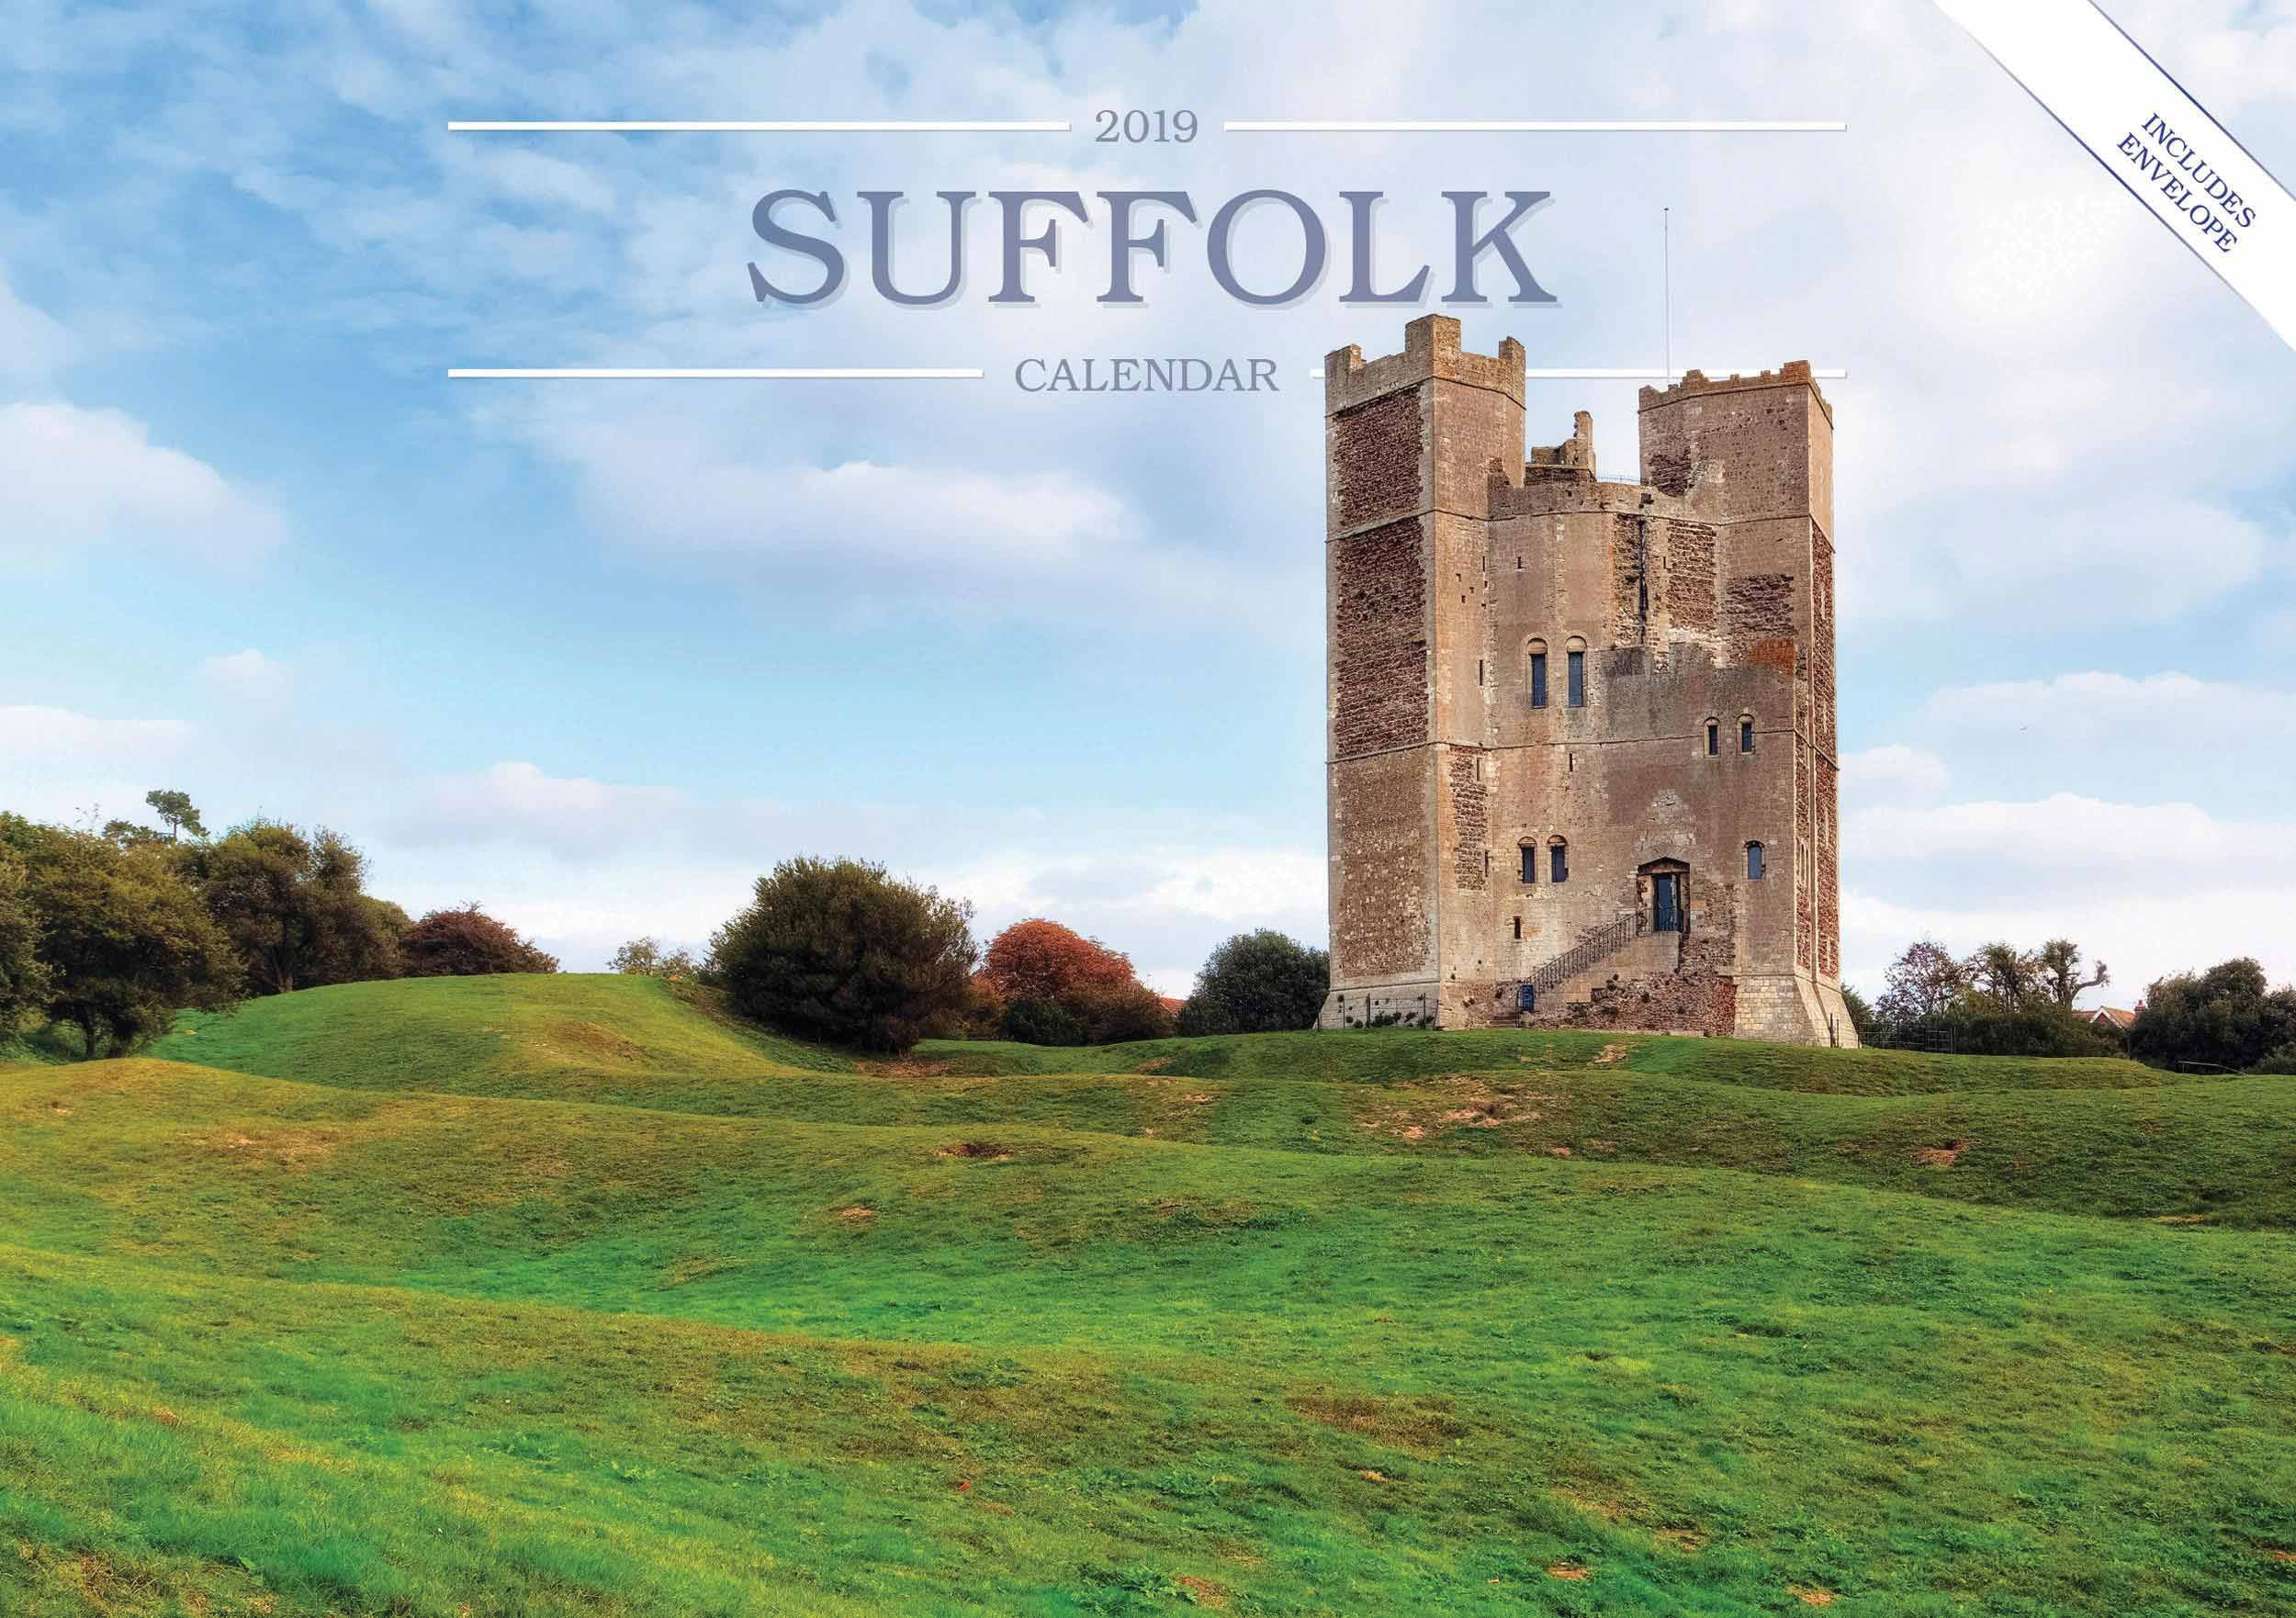 Suffolk Calendar 2019 Suffolk A5 2019: 9781786670861: Amazon.com: Books